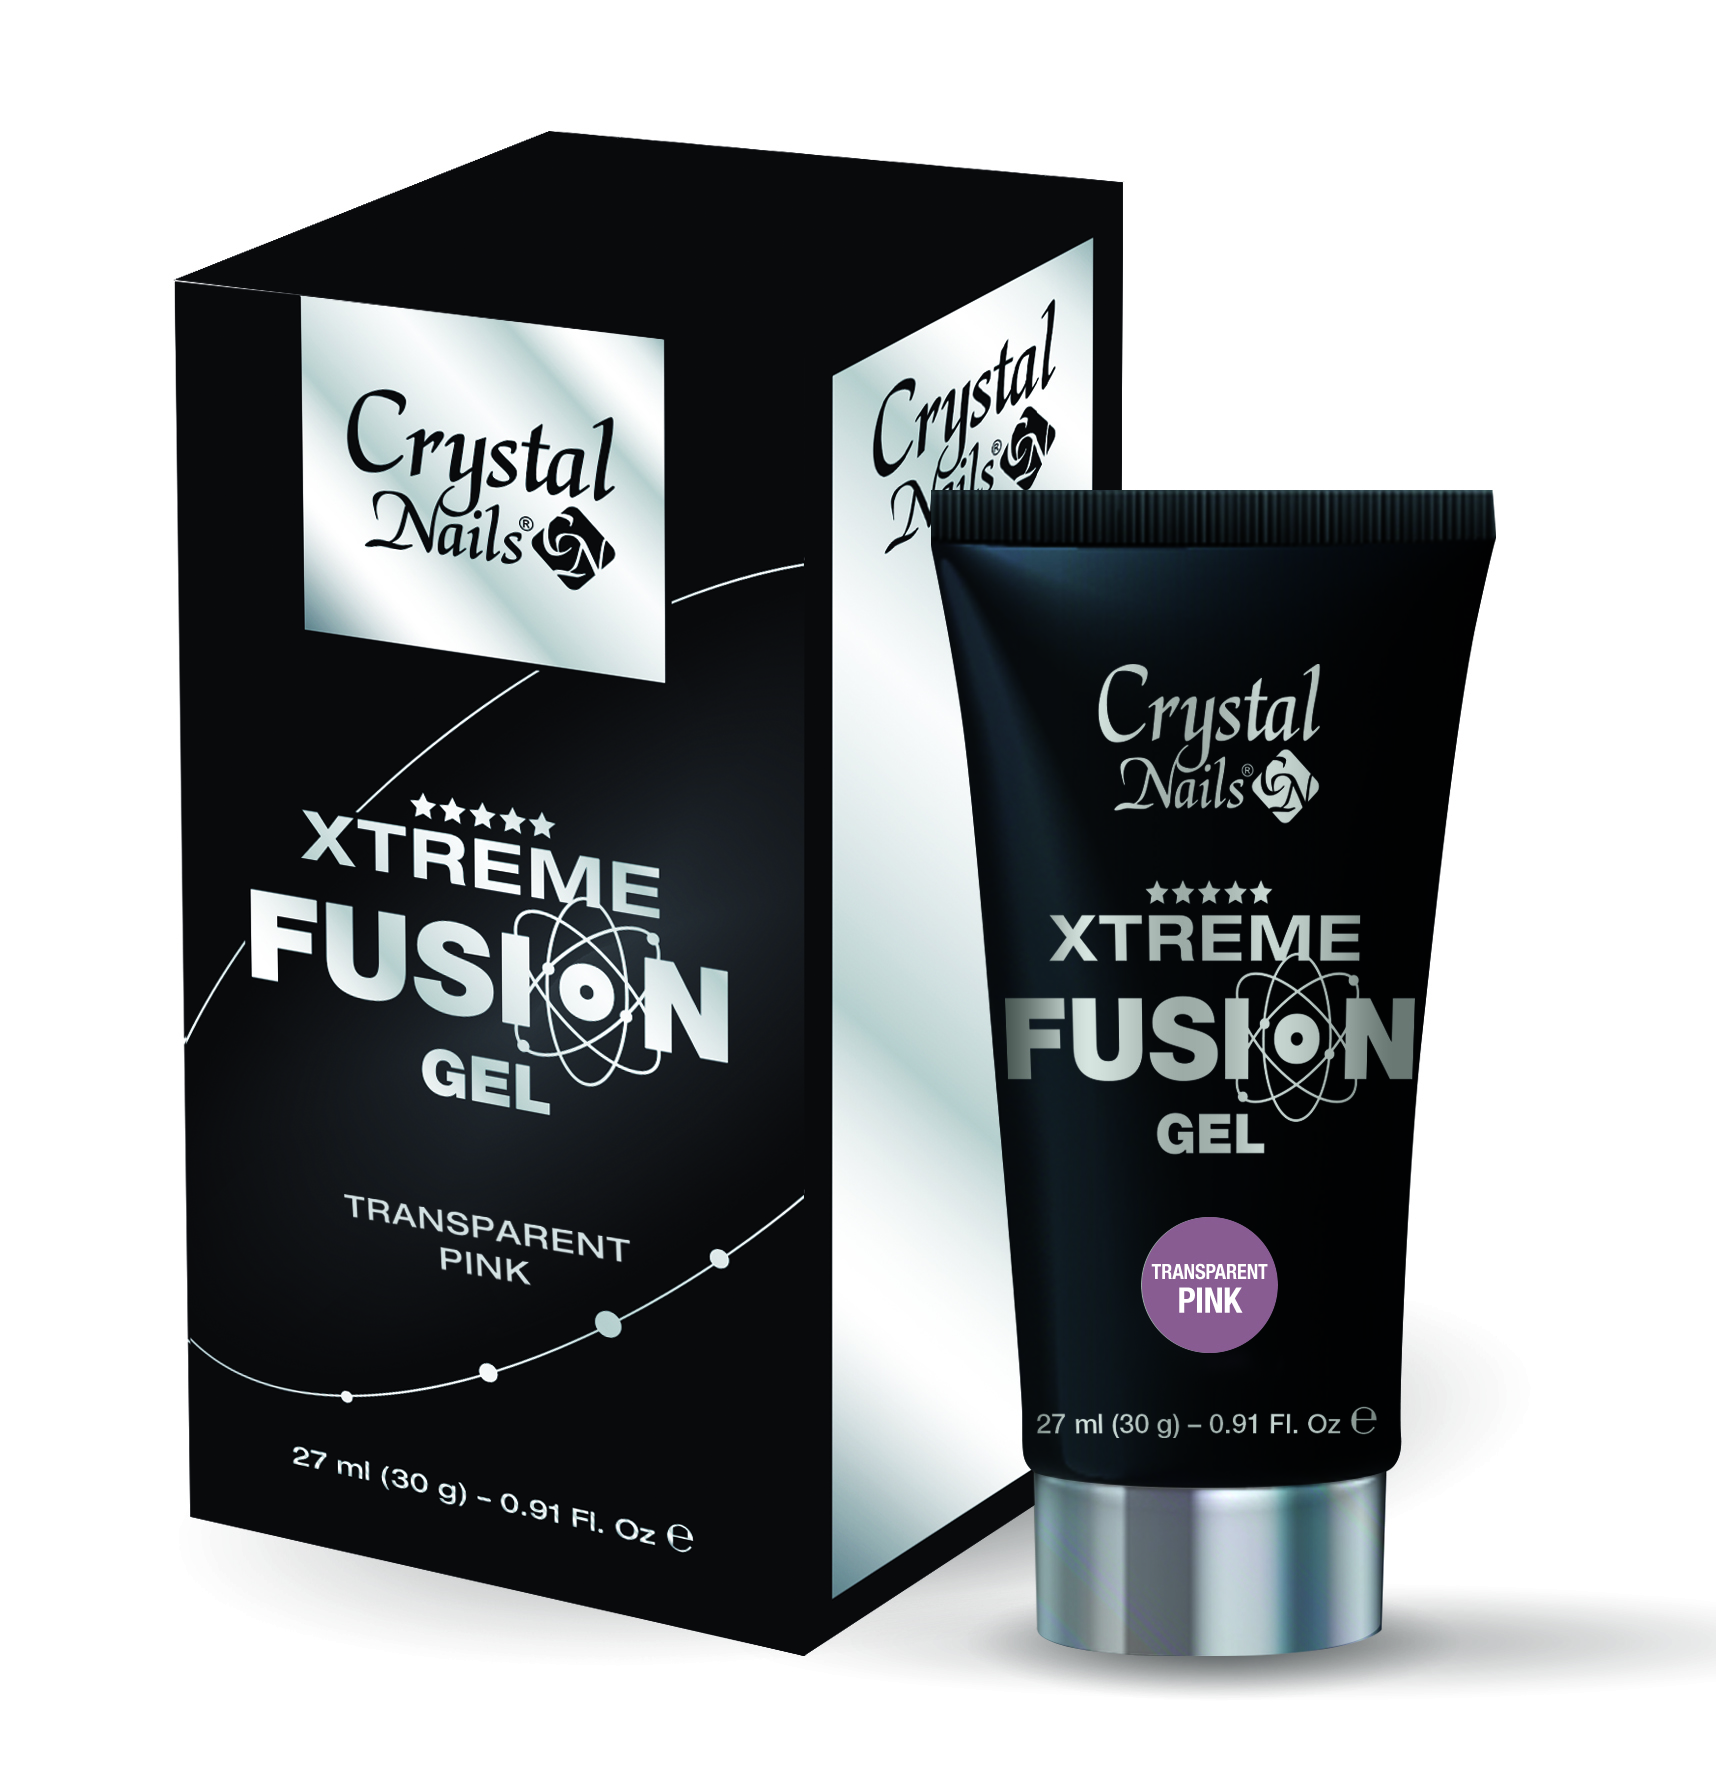 Xtreme Fusion AcrylGel Transparent Pink – 30g